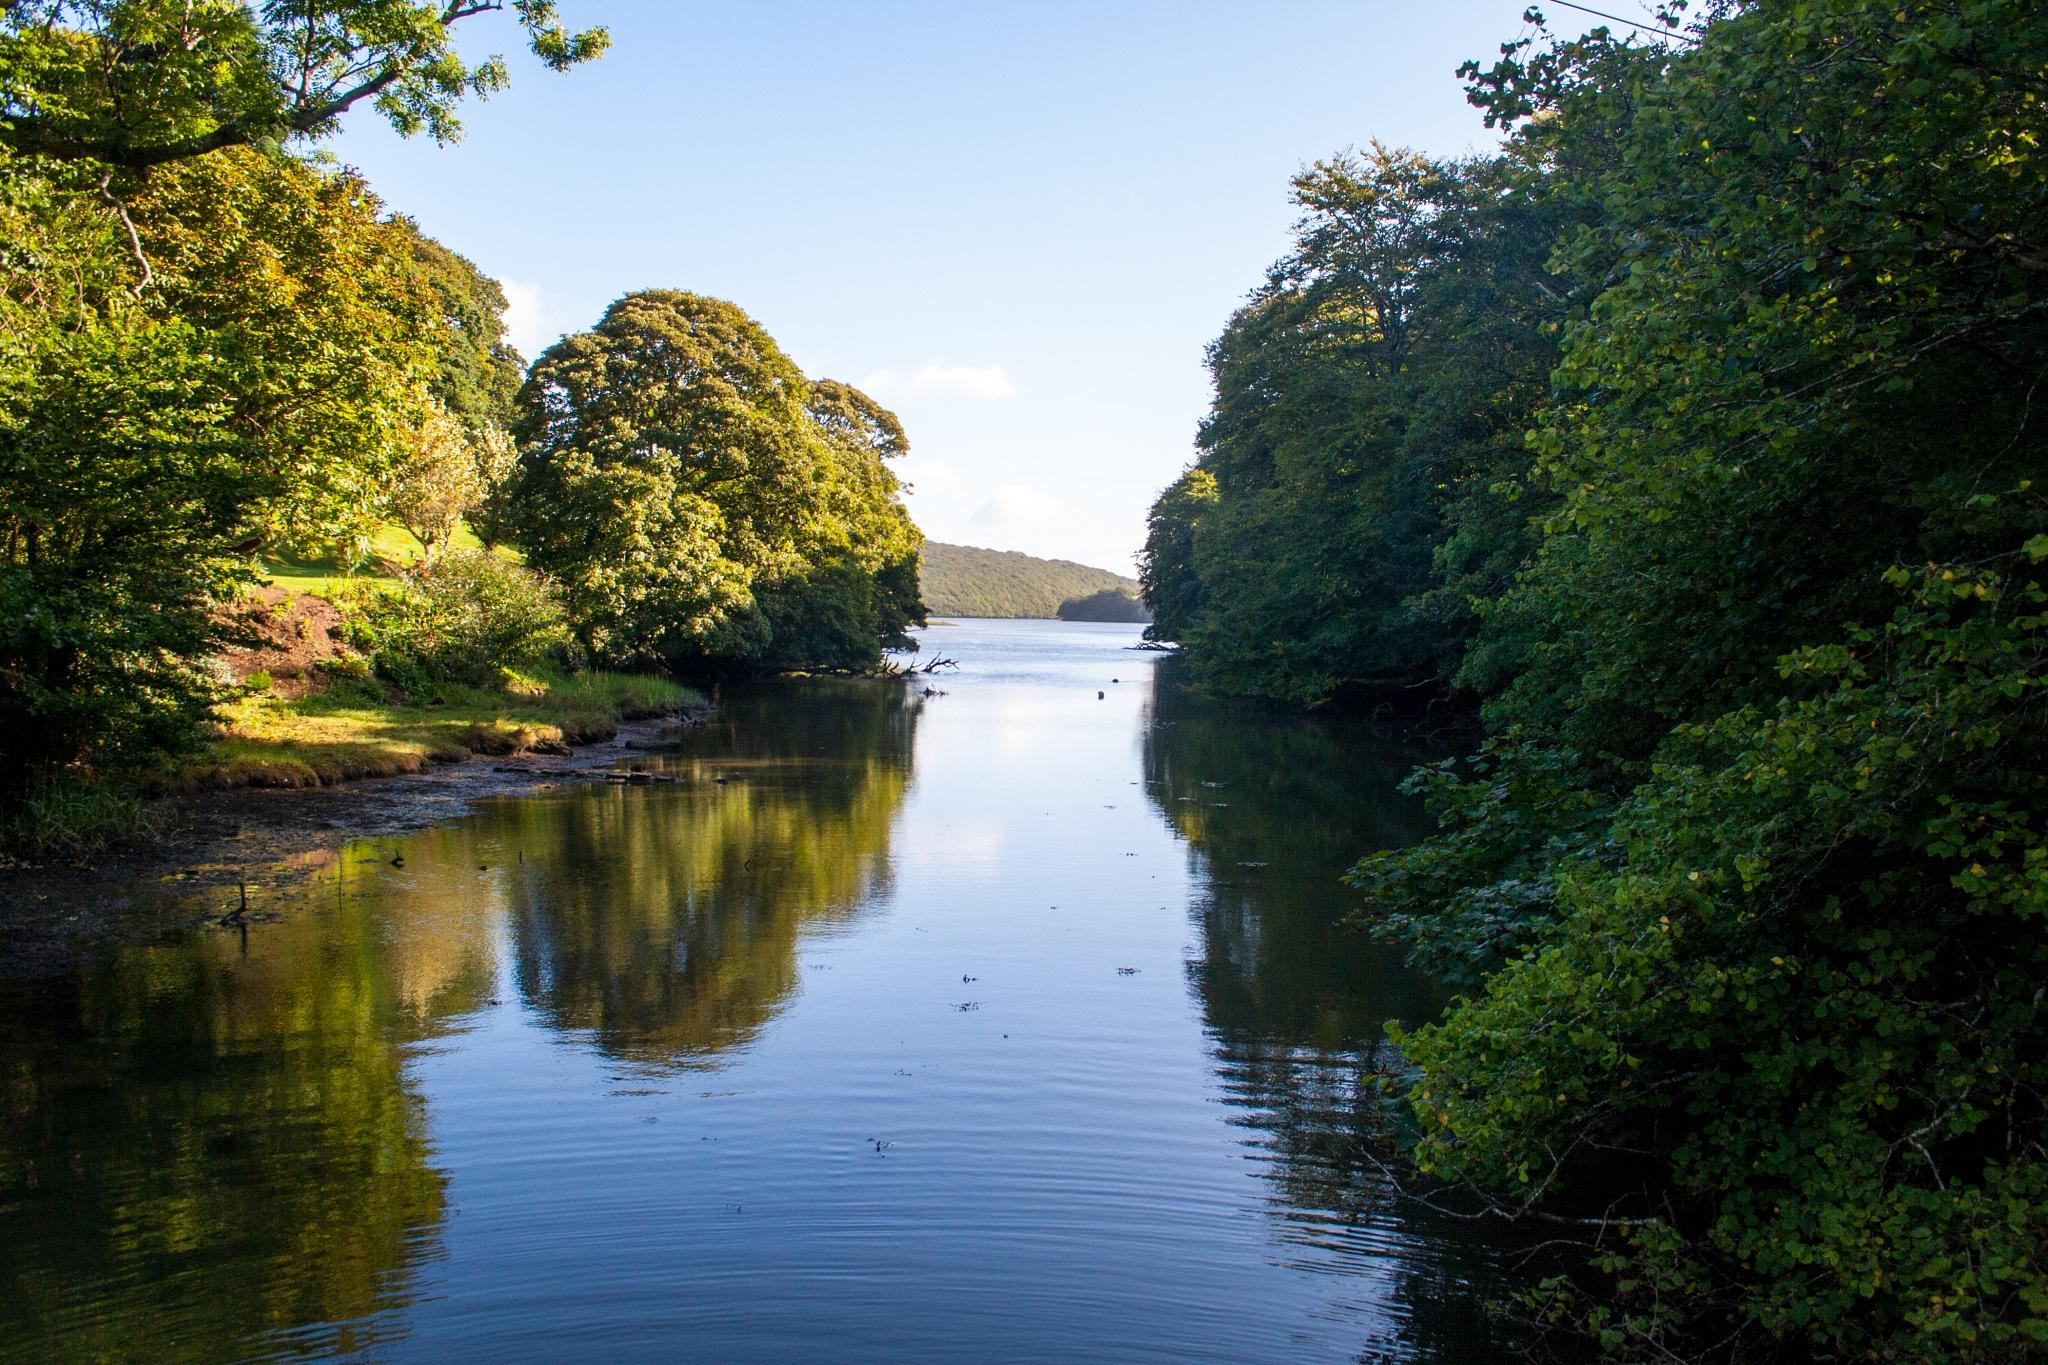 Creekside Reflections by Steve Rowe